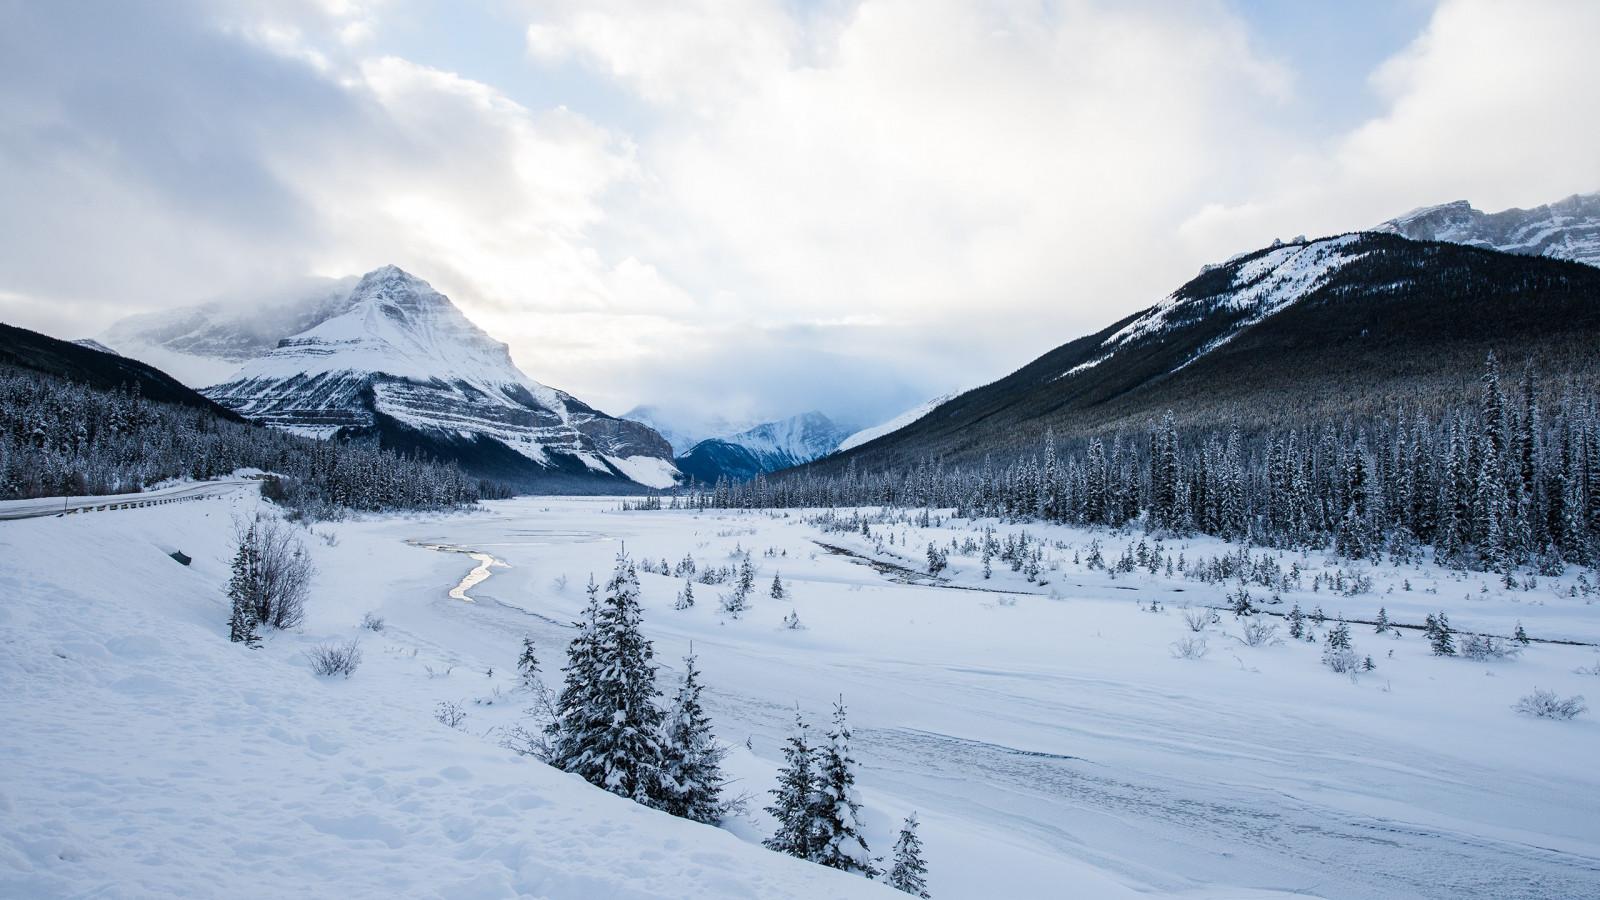 Fondo Escritorio Paisaje Nevada En Cumbre: Fondos De Pantalla : Paisaje, Montañas, Nieve, Puerto De